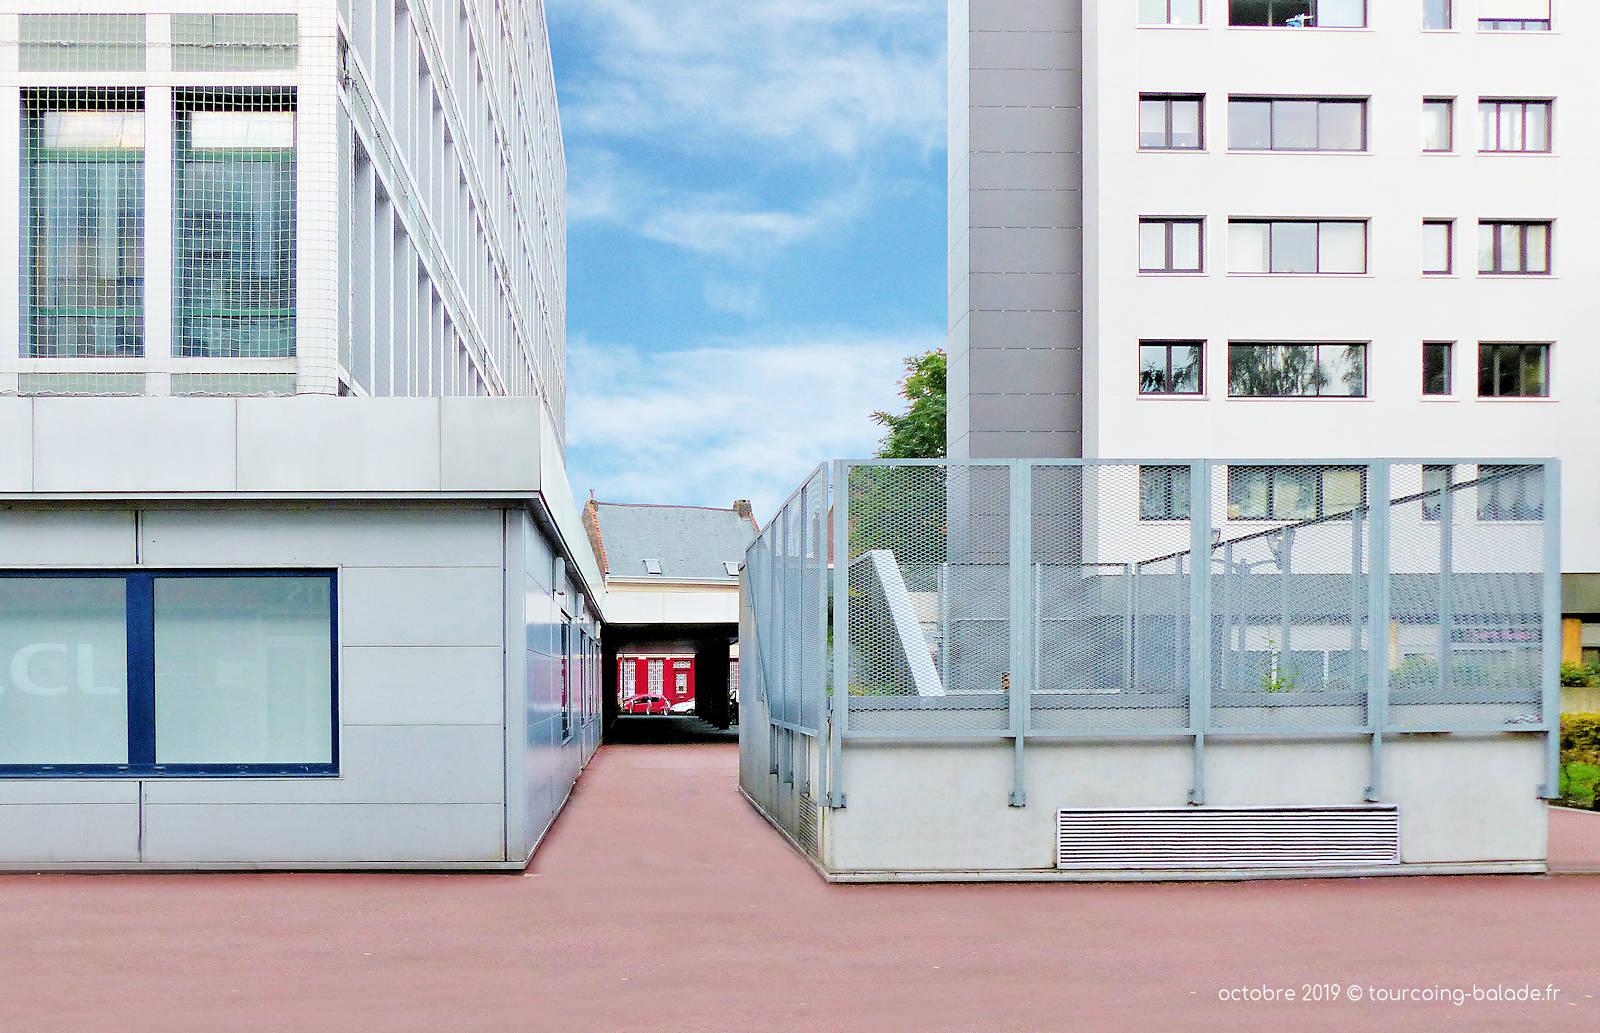 Notaires Adrover Huet Hibon, Tourcoing - Promenade de la Fraternité